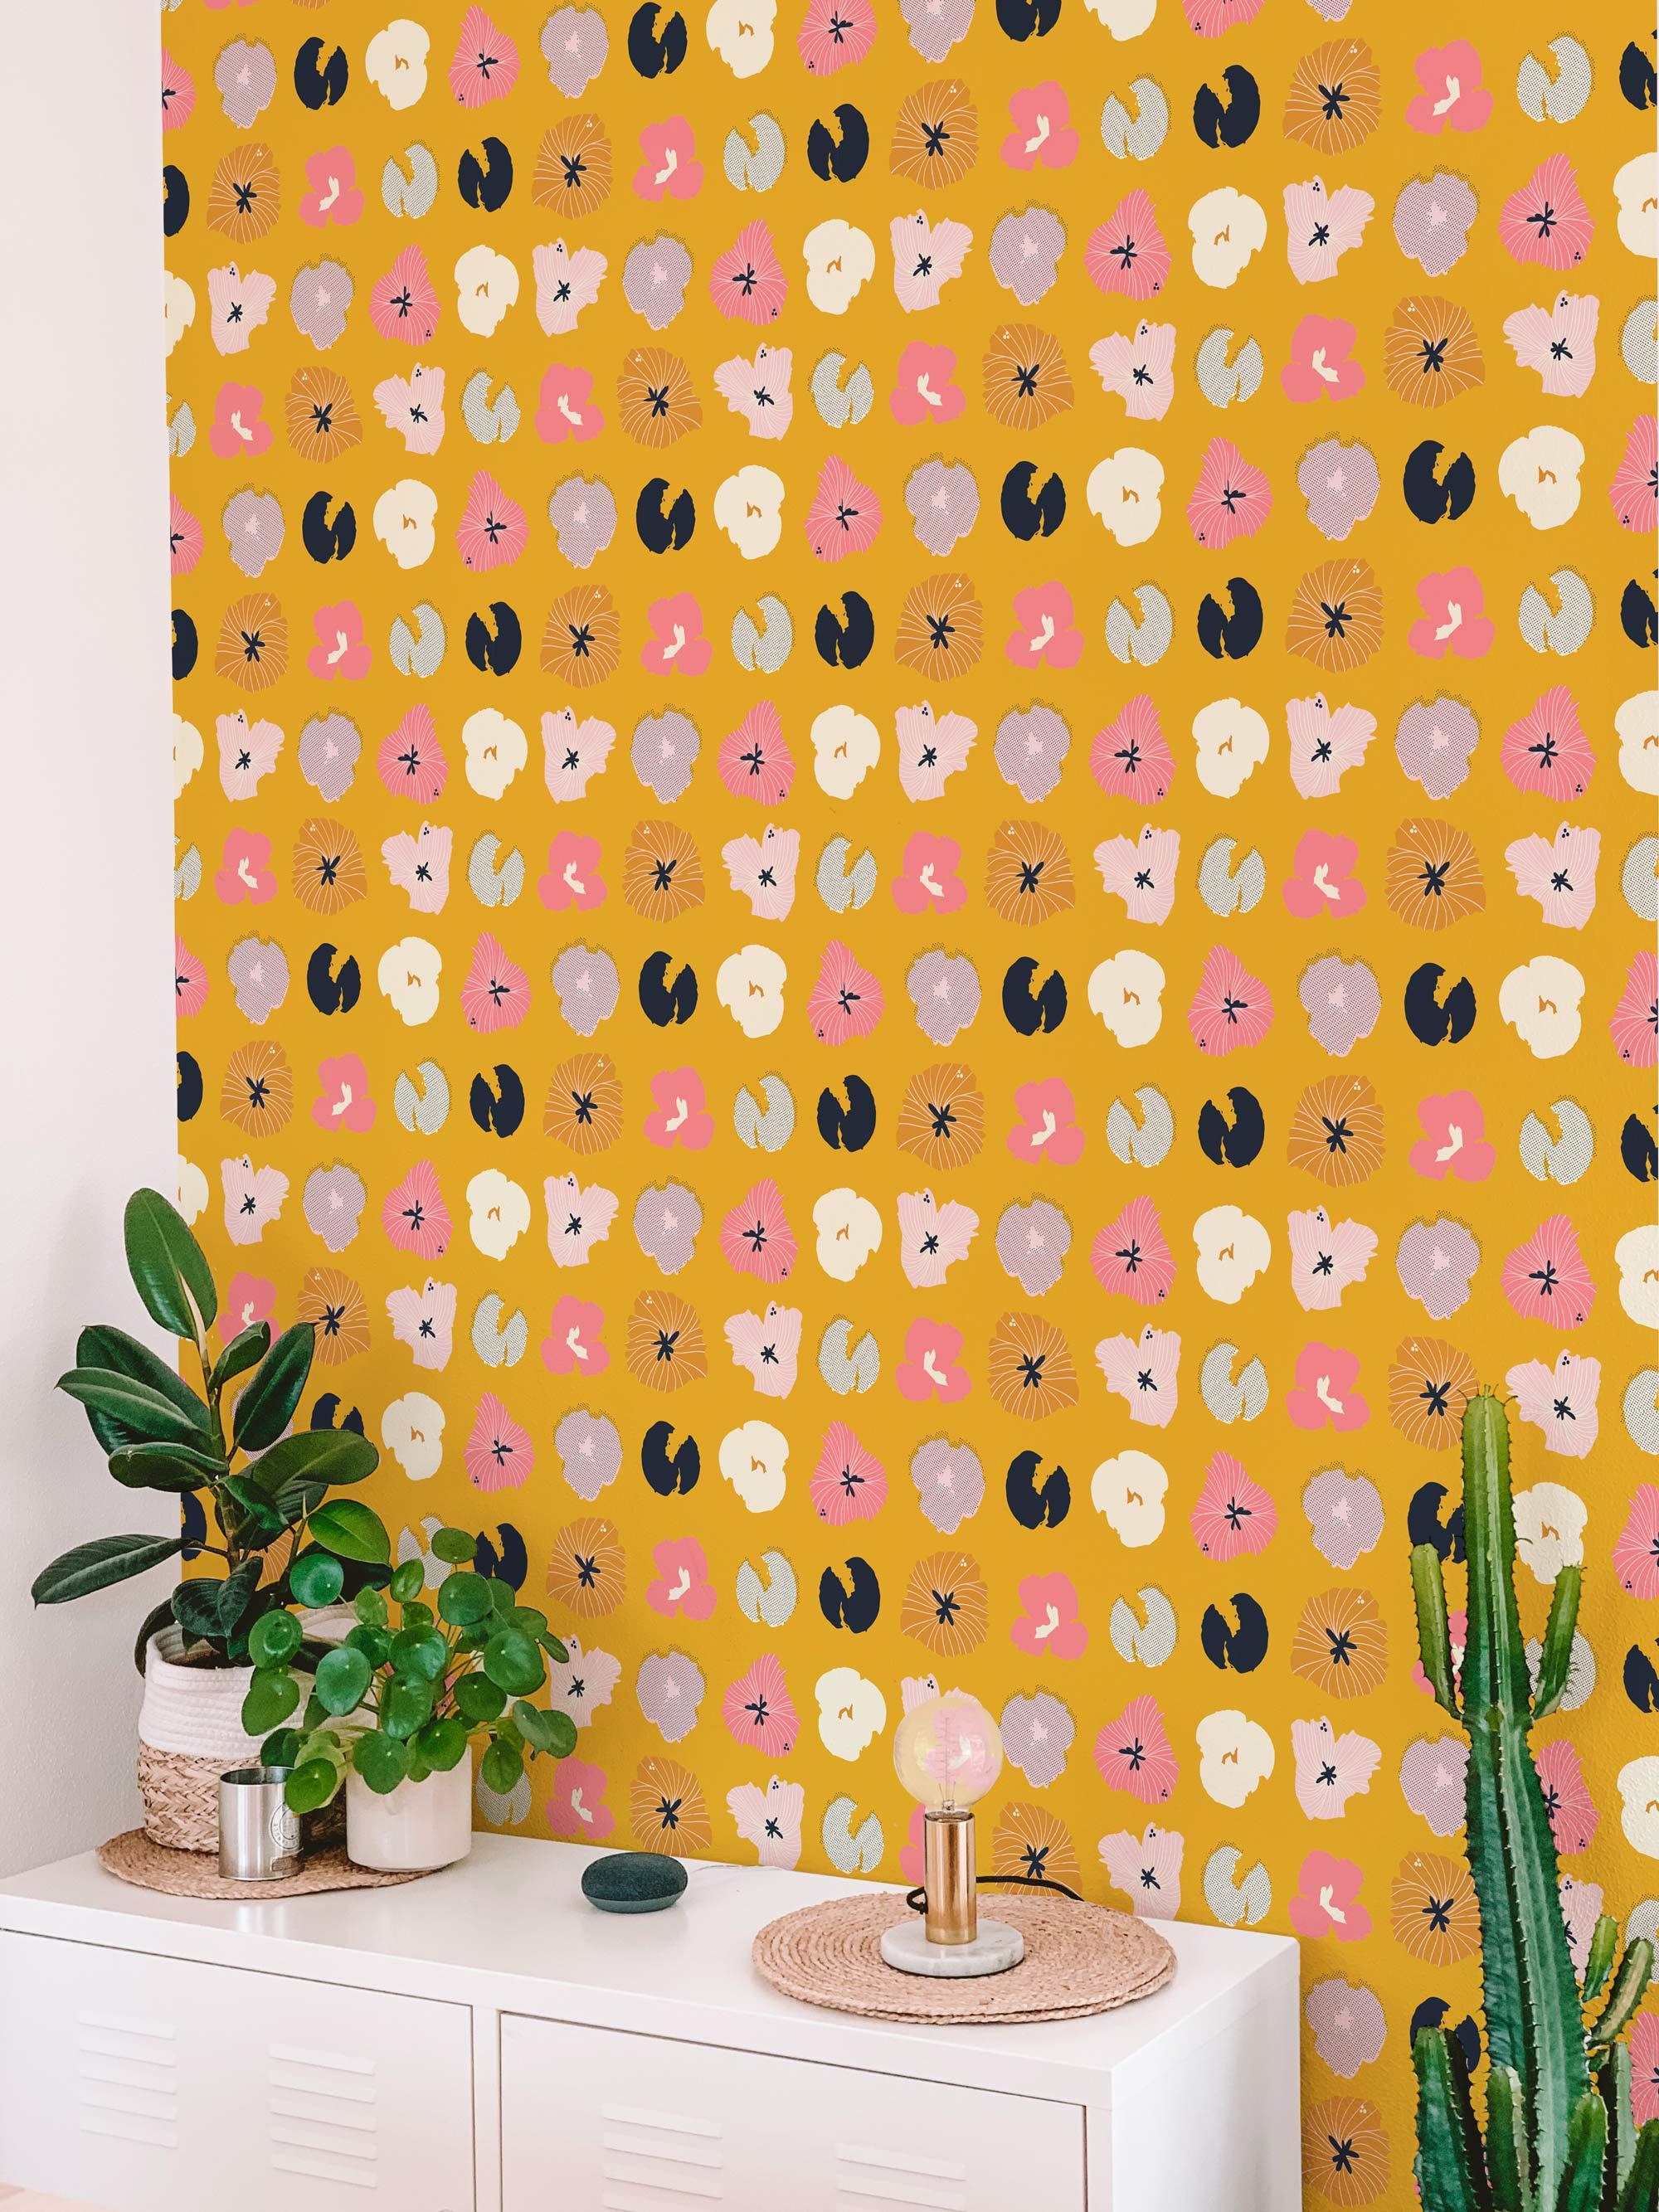 Peel-and-Stick Removable Wallpaper Paprika Floral Watercolor Floral Orange